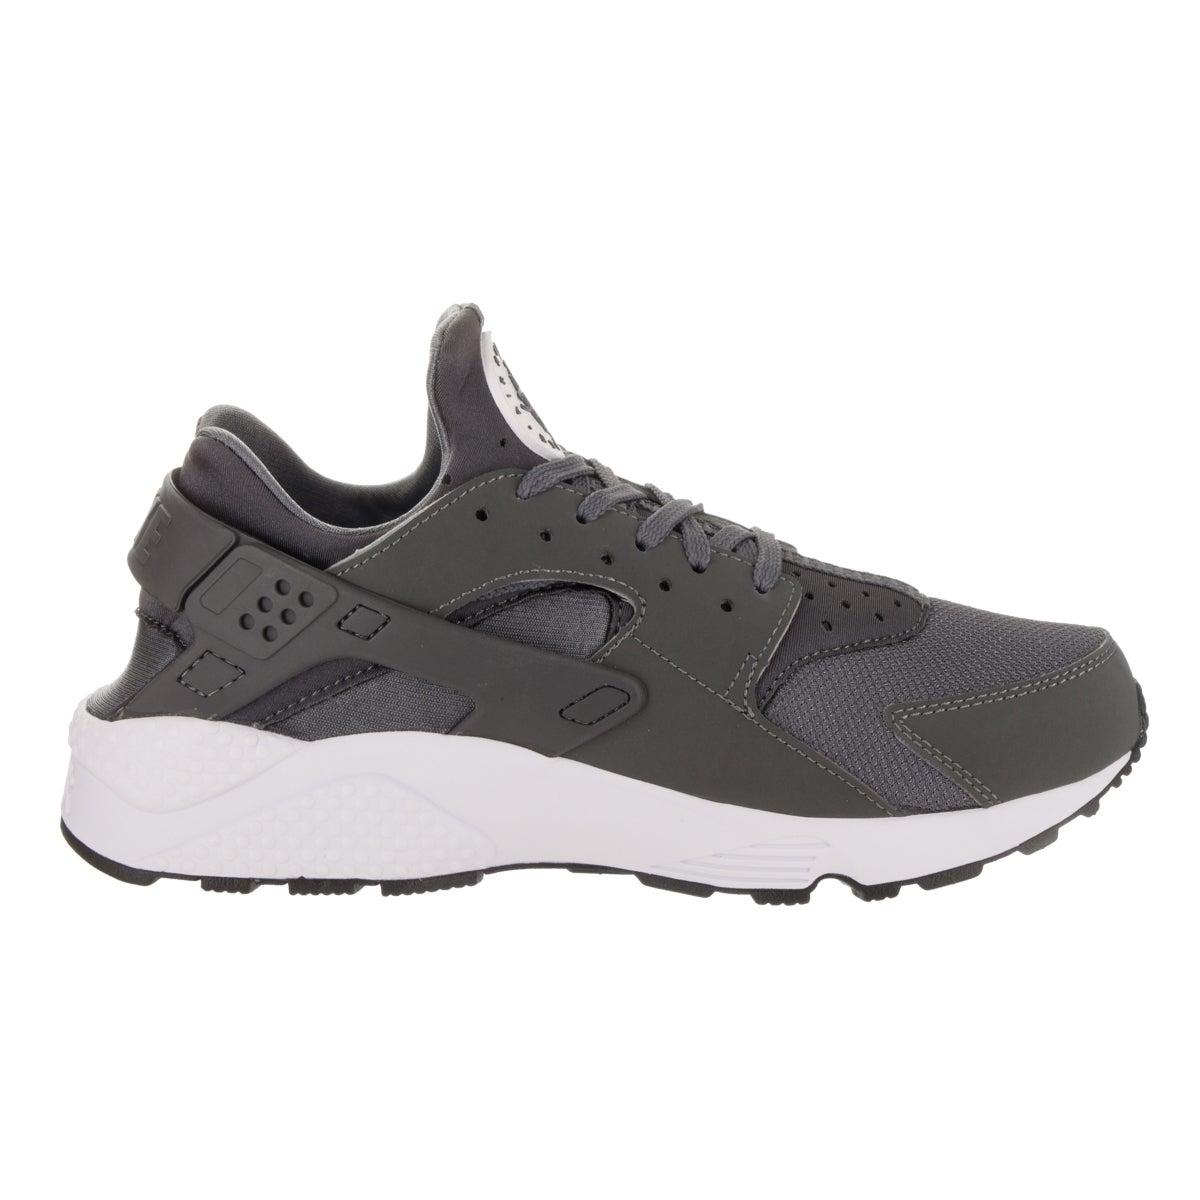 new style c5a3e 90640 Shop Nike Men s Air Huarache Running Shoe - Free Shipping Today - Overstock  - 16739458